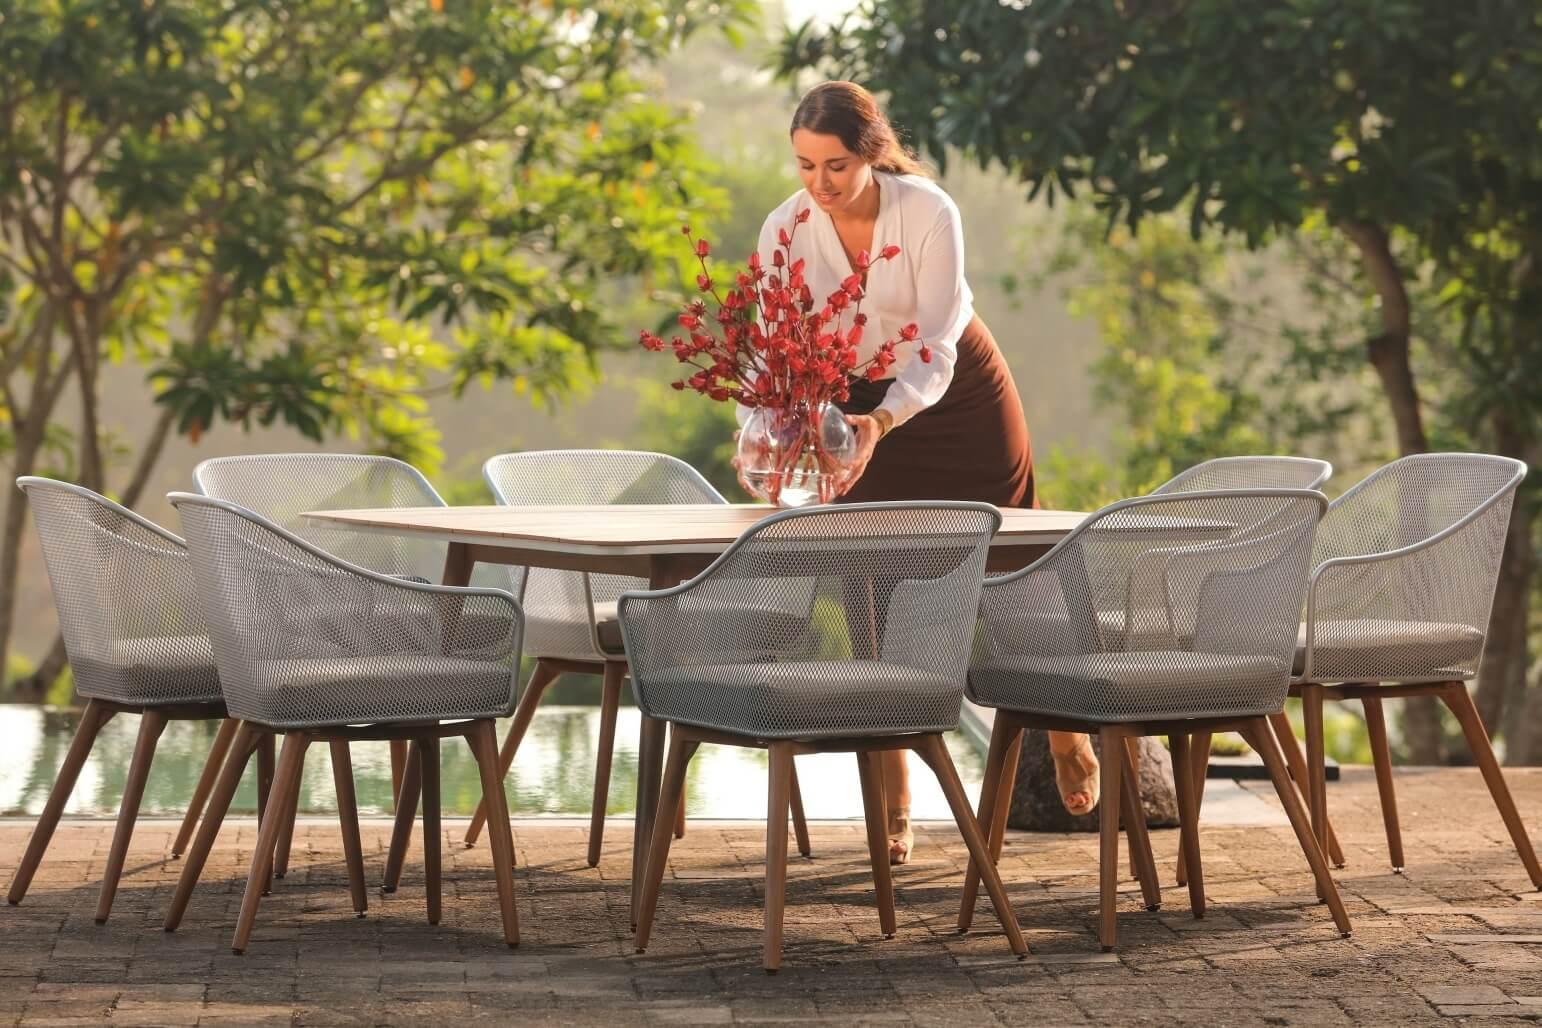 mbm schmiedeeisen resysta sitzgruppe ohio silber 8 personen. Black Bedroom Furniture Sets. Home Design Ideas